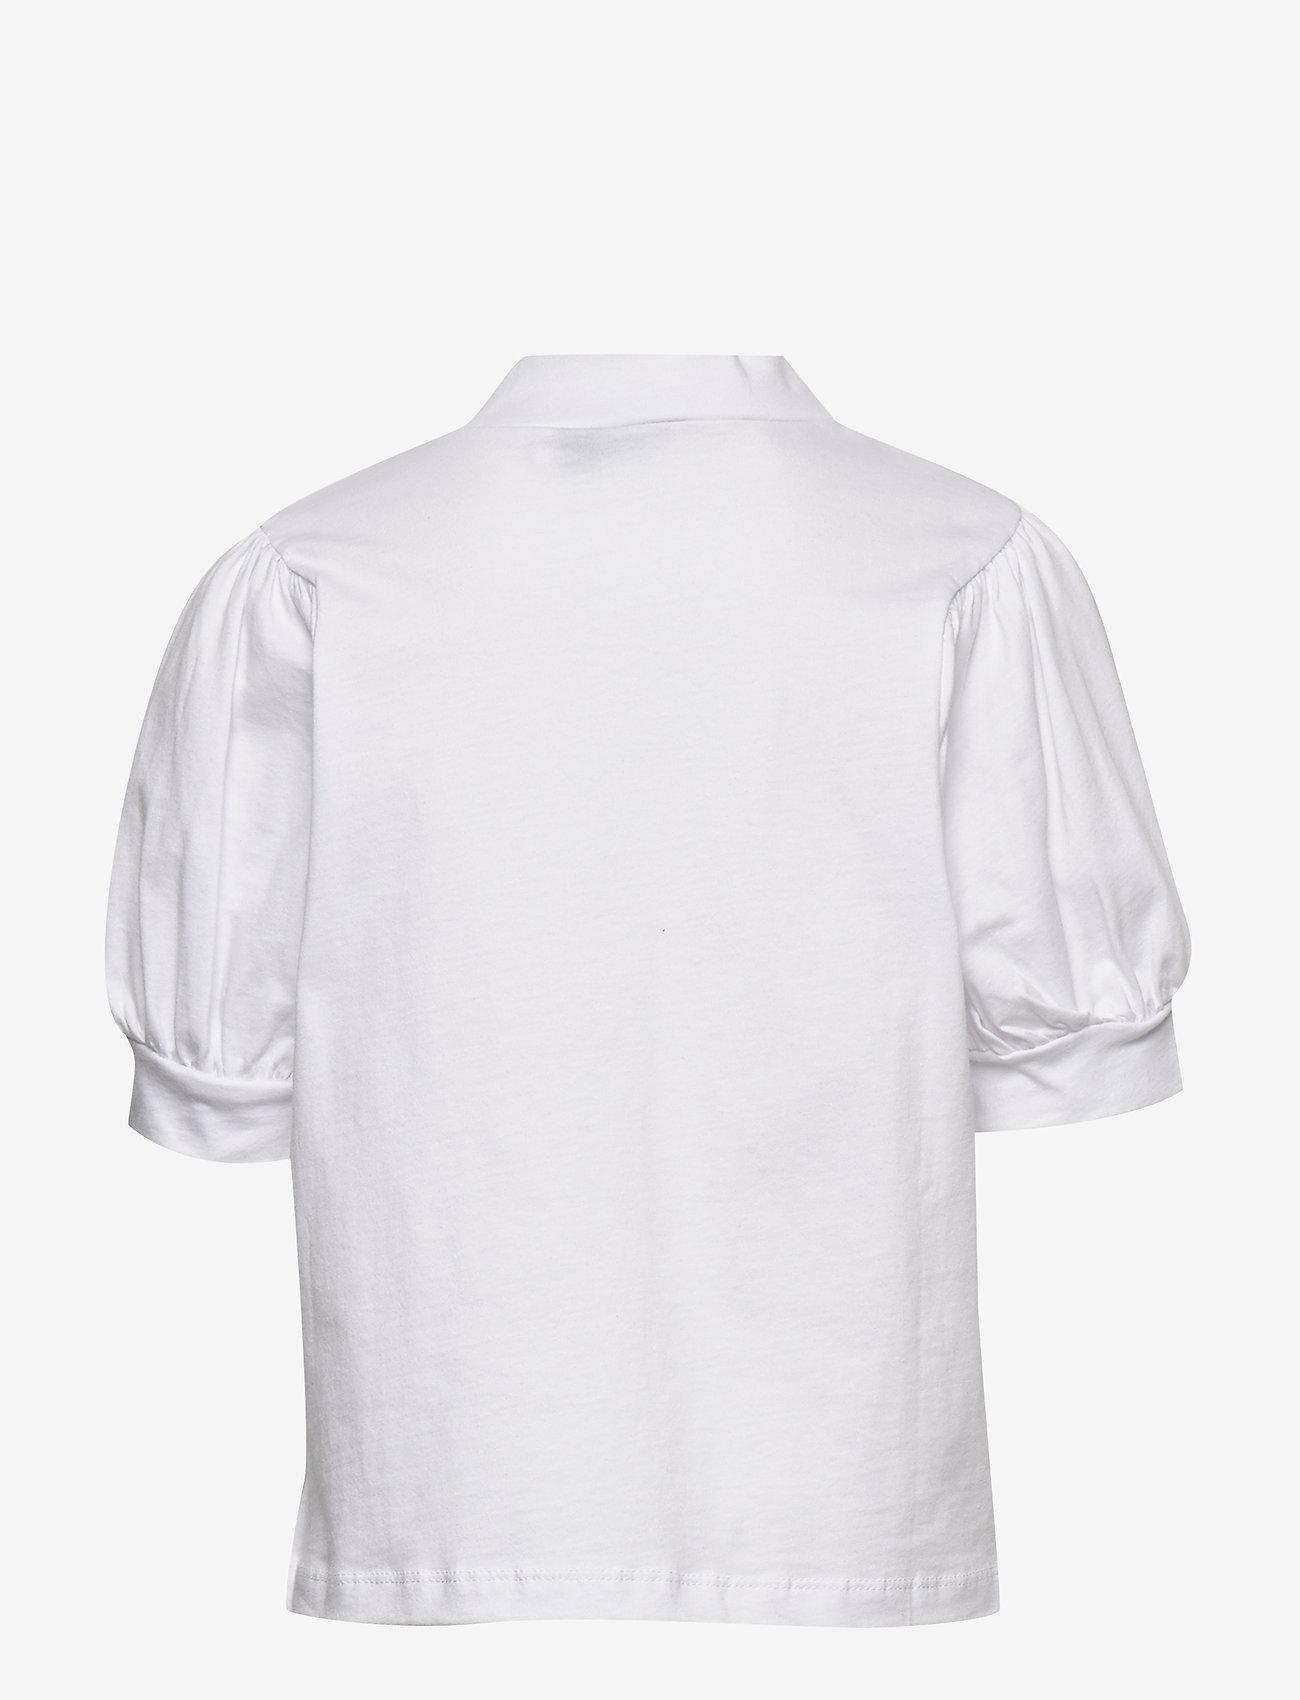 LMTD - NLFFUFF BALLON SHORT TOP - t-shirts - bright white - 1